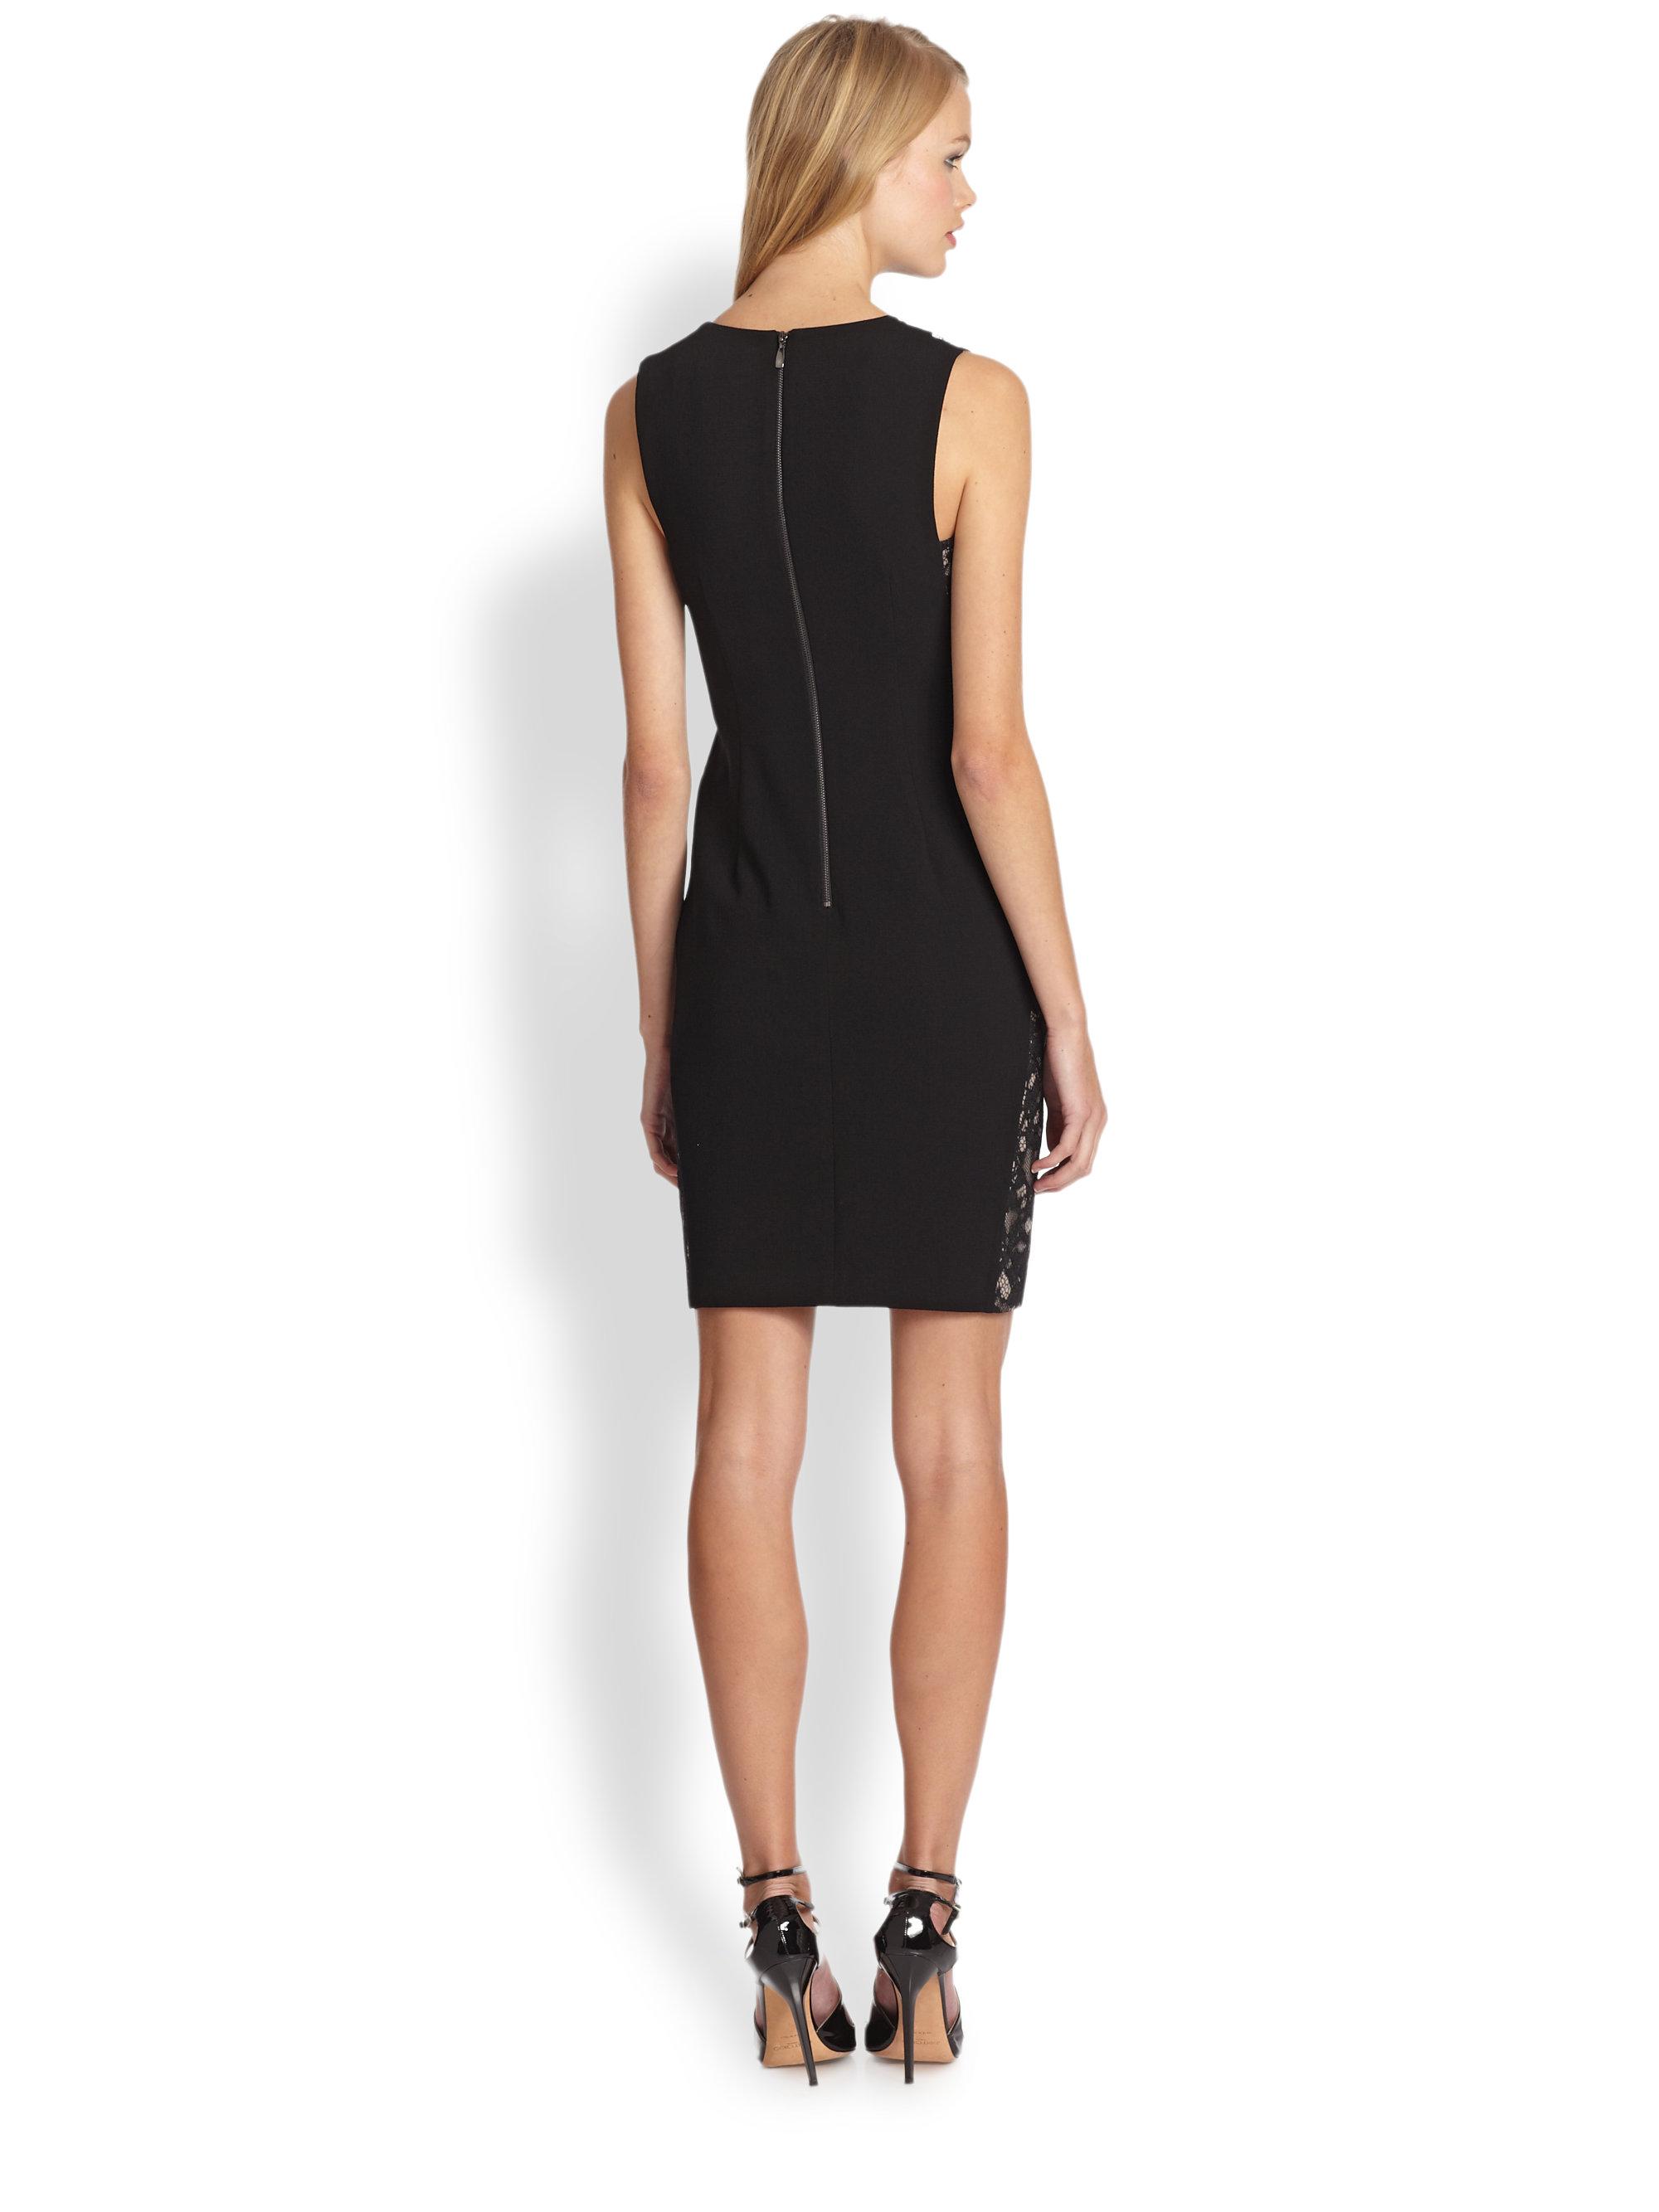 Trina turk Tappe Lace-trimmed Dress in Black - Lyst